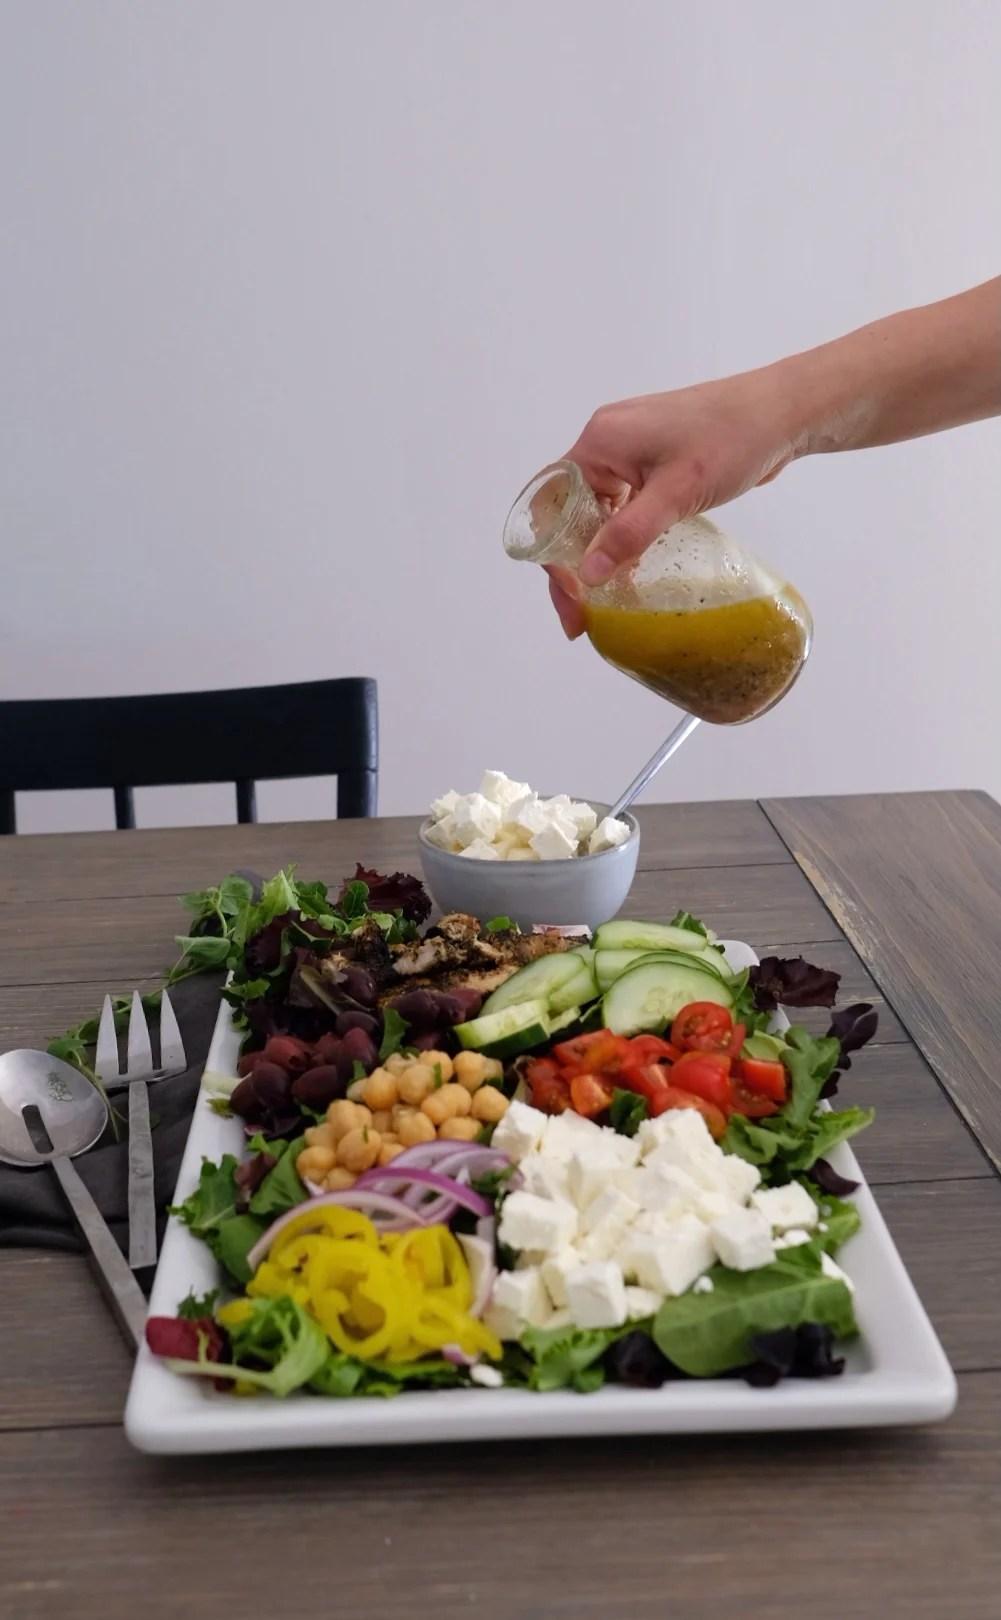 Lemon and Oregano Greek Salad Dressing